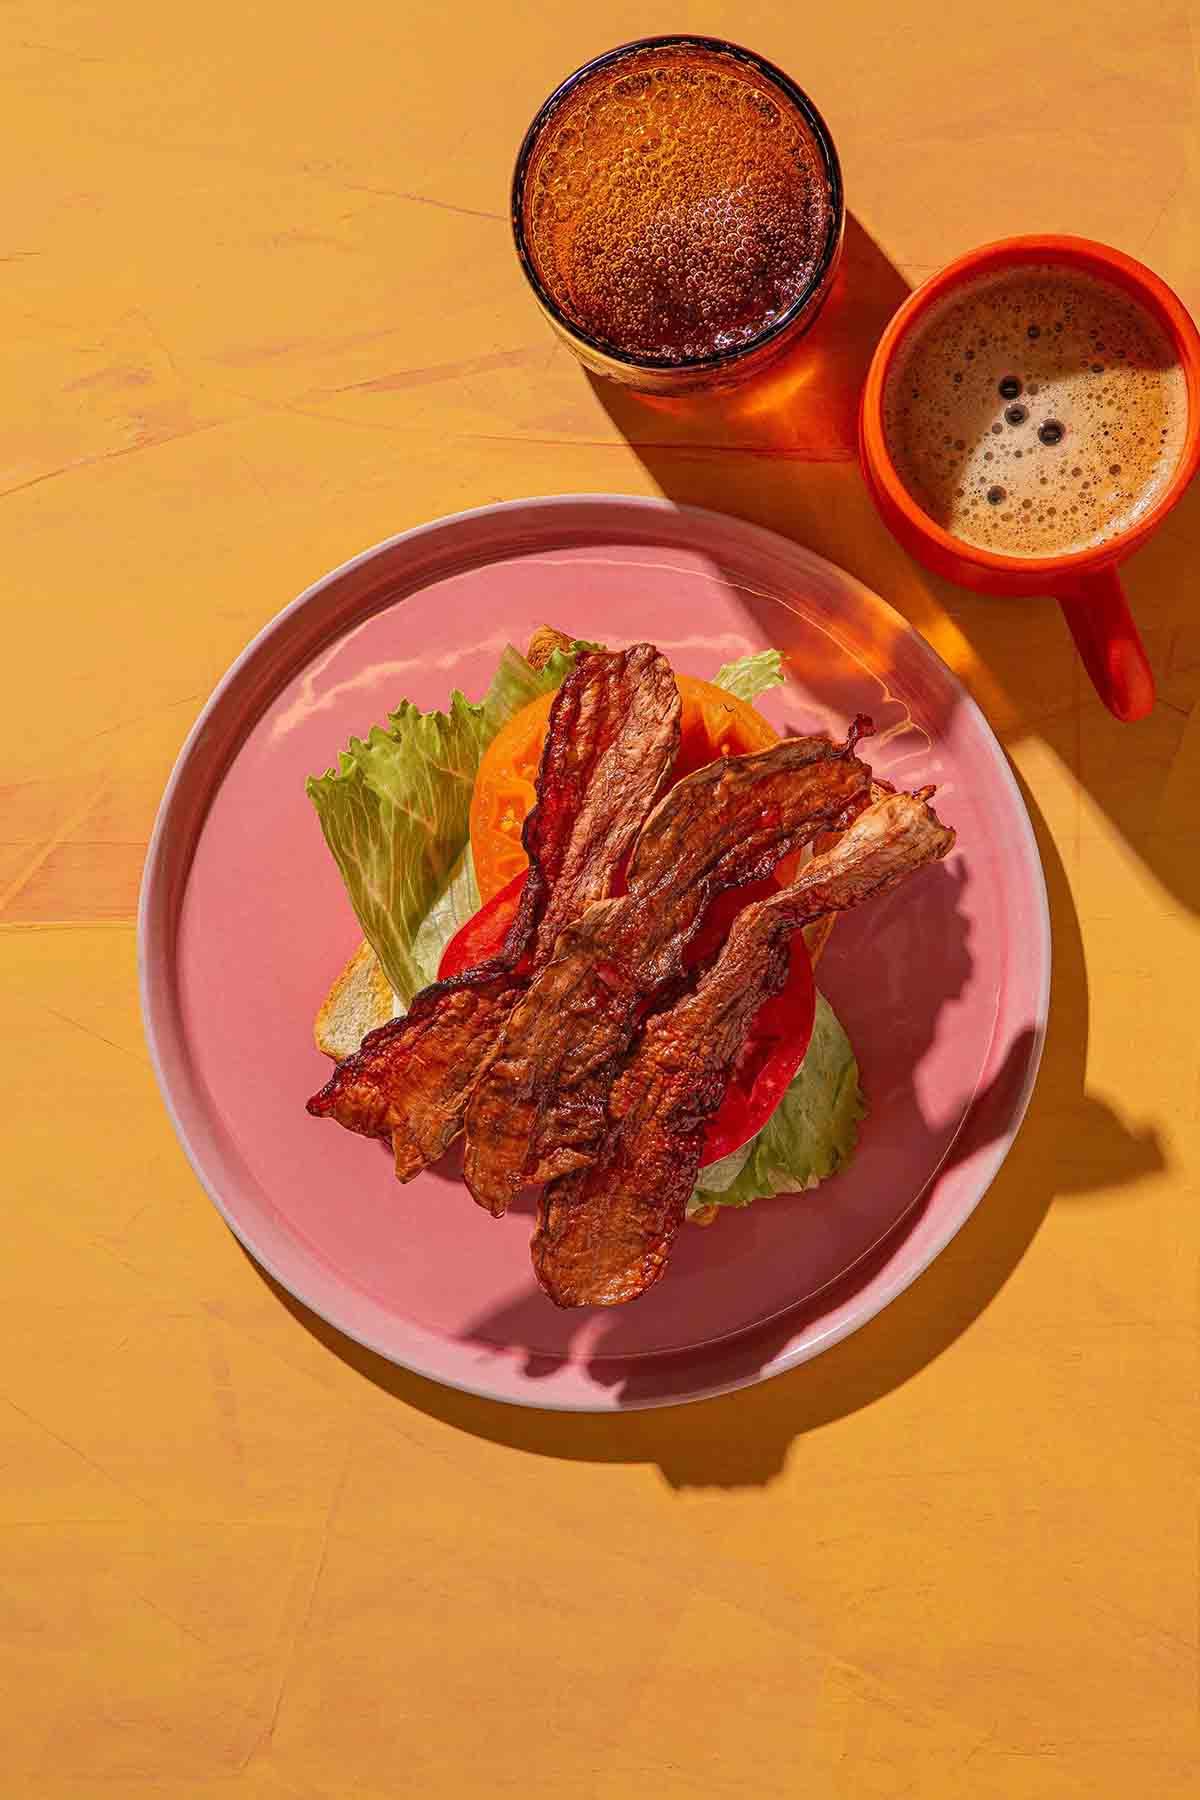 vegan bacon from Atlast Food Co.